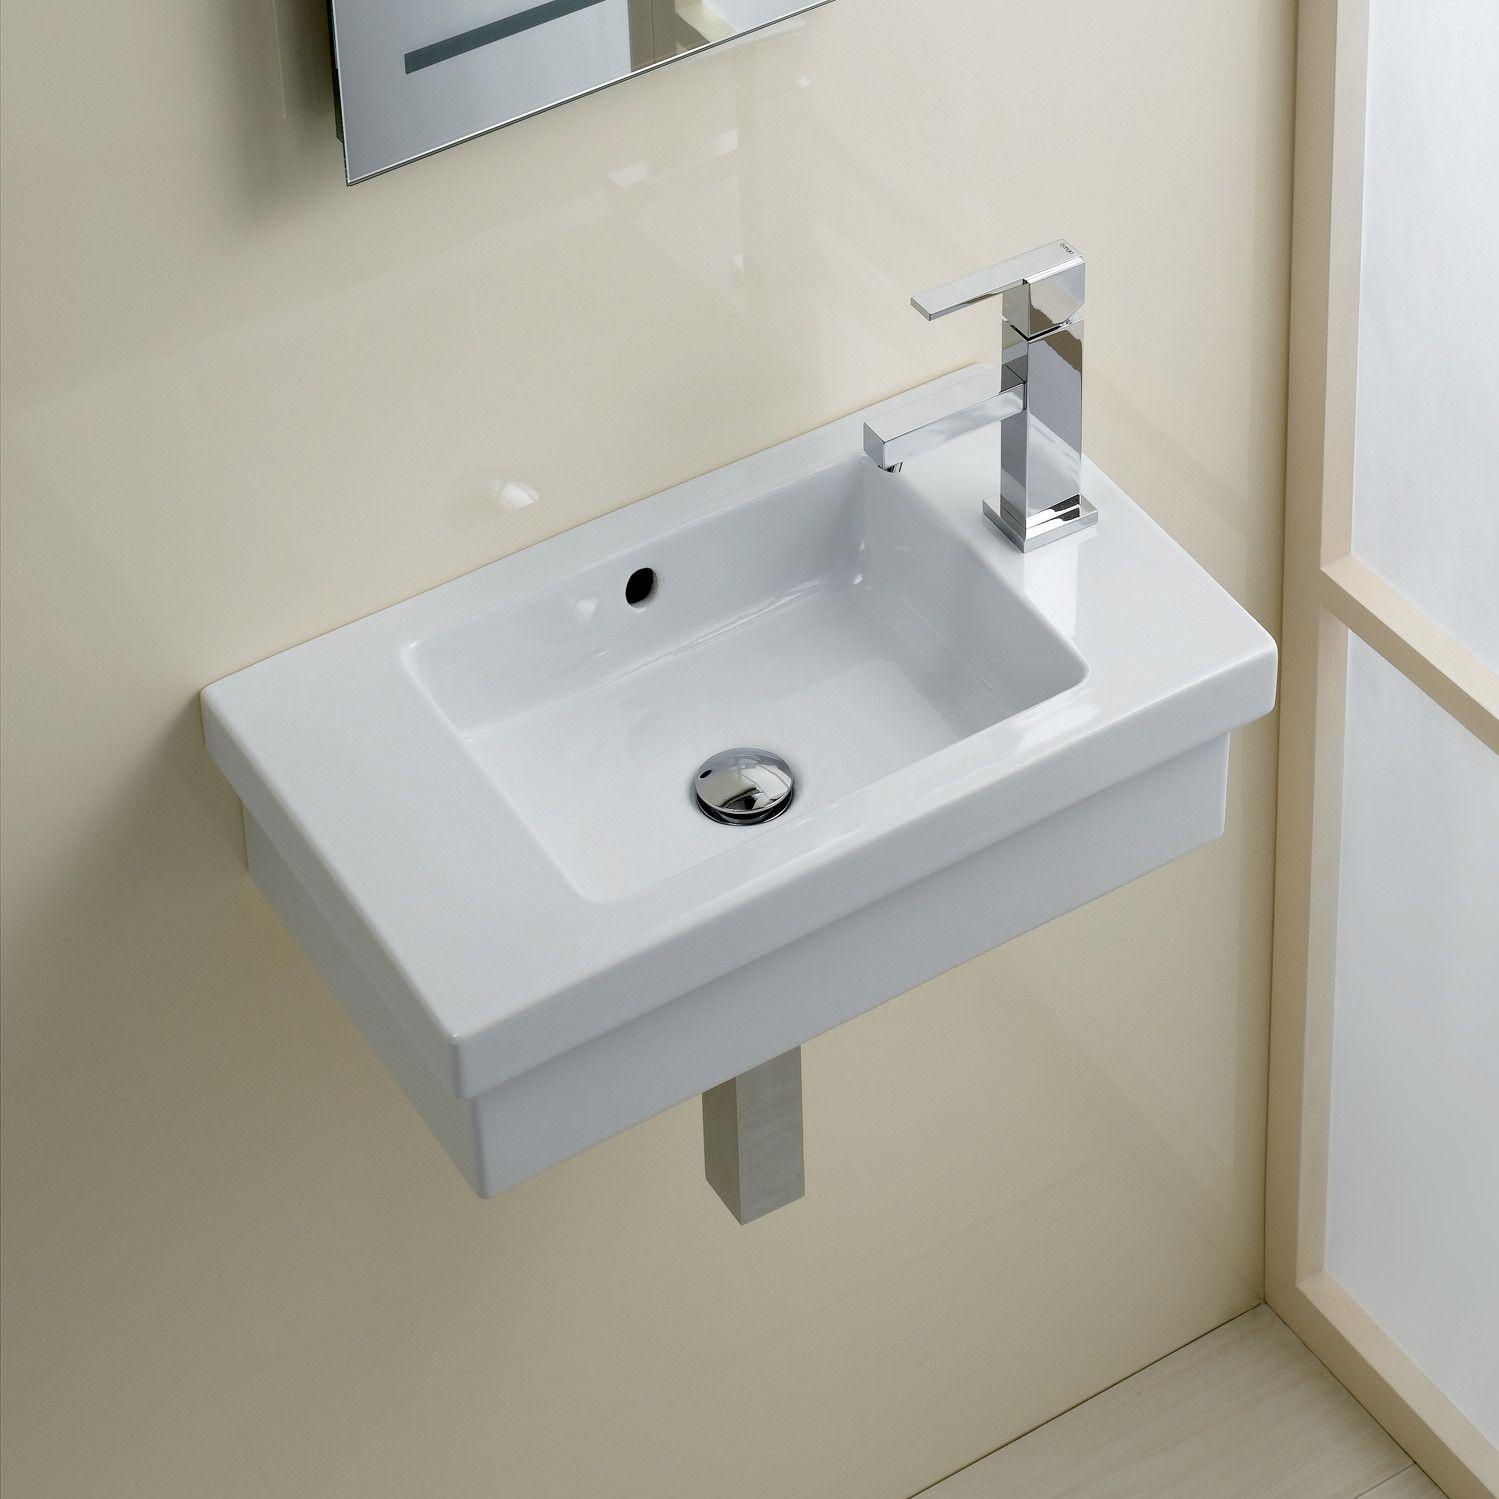 Bissonnet Area Boutique Logic 45 Ceramic Bathroom Sink & Reviews Inspiration Wayfair Bathroom Sinks Design Inspiration